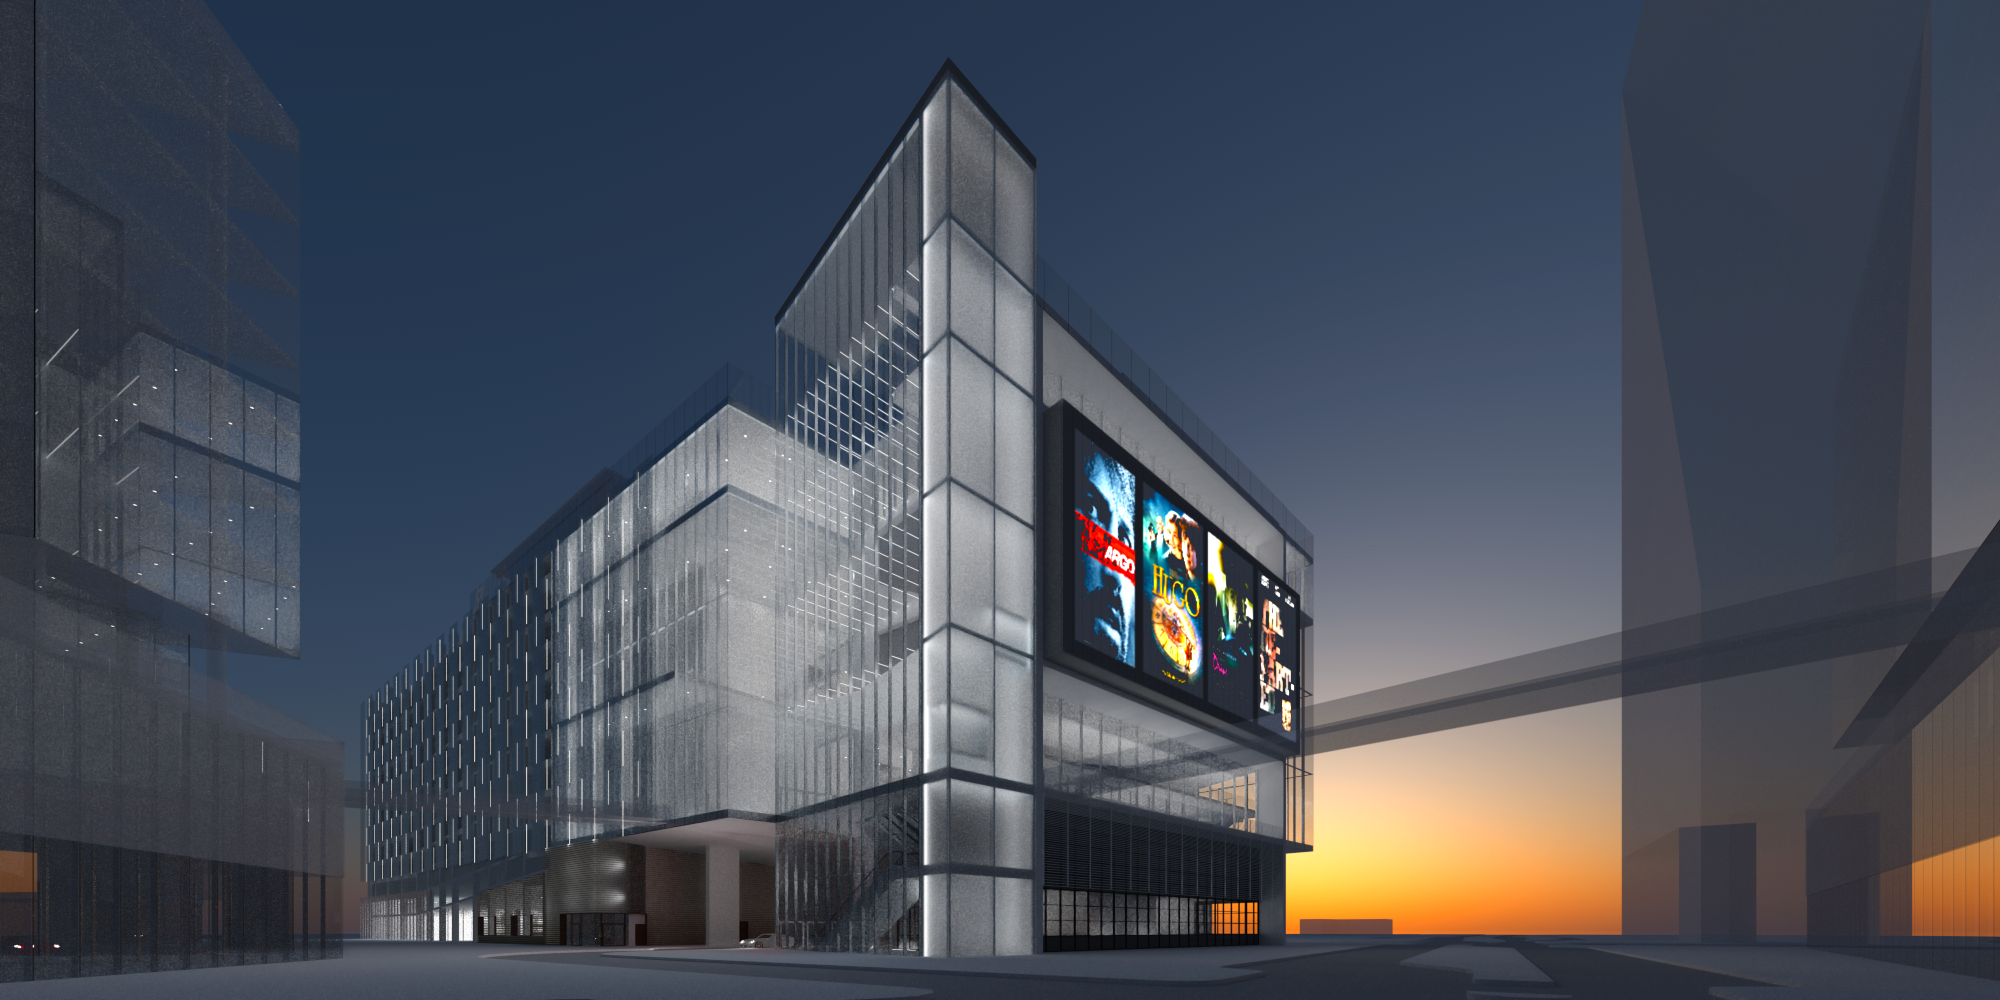 Ross Field Film Center—2014